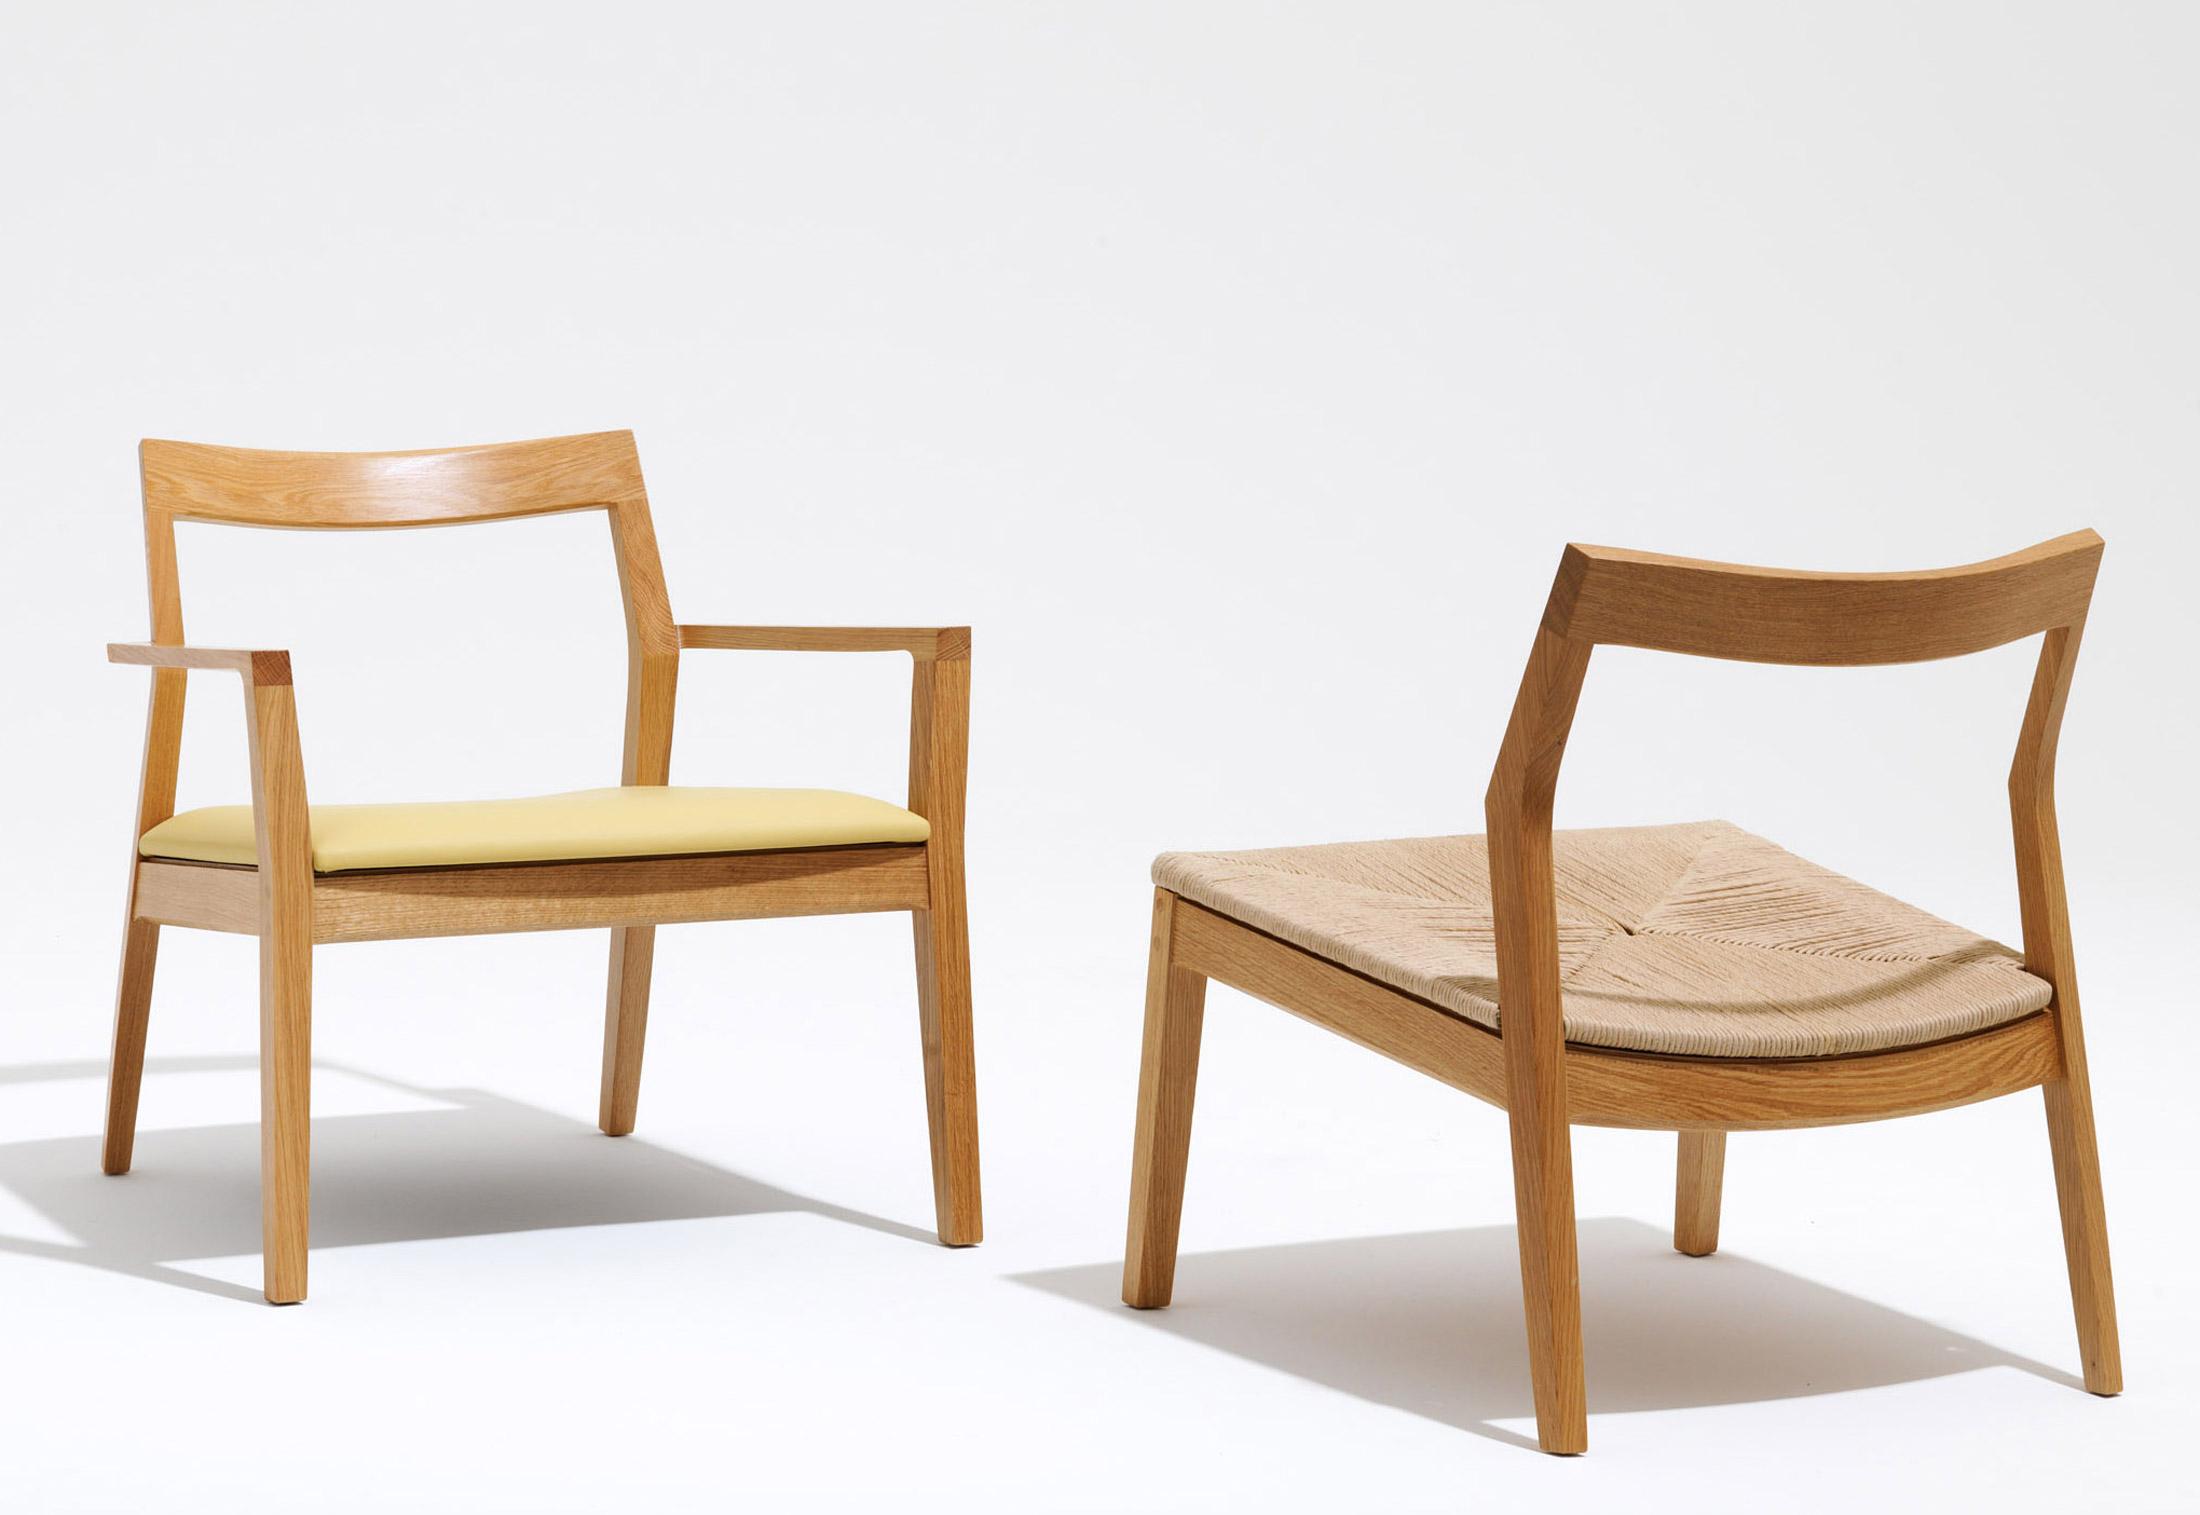 Cool Krusin Lounge Chair With Armrests By Knoll Stylepark Creativecarmelina Interior Chair Design Creativecarmelinacom